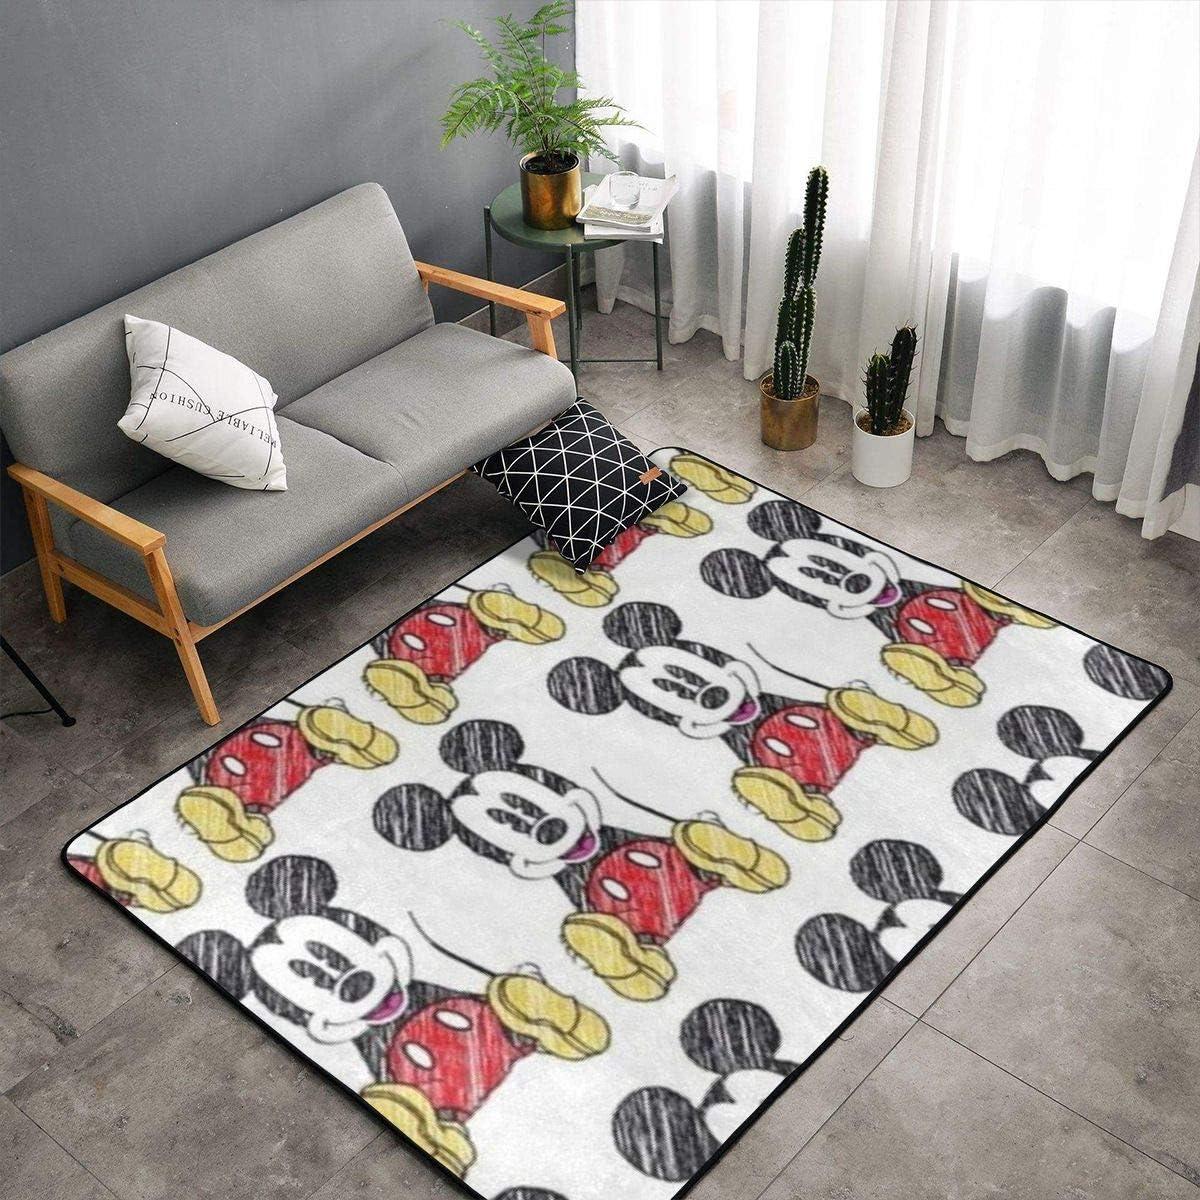 gaoyou Movie Mandalorian Carpet Non-Slip Area Rugs Bedroom Camping Soft Carpets Kids Room Area Rug Nursery Home Decor Carpet 60 X 39 Inches